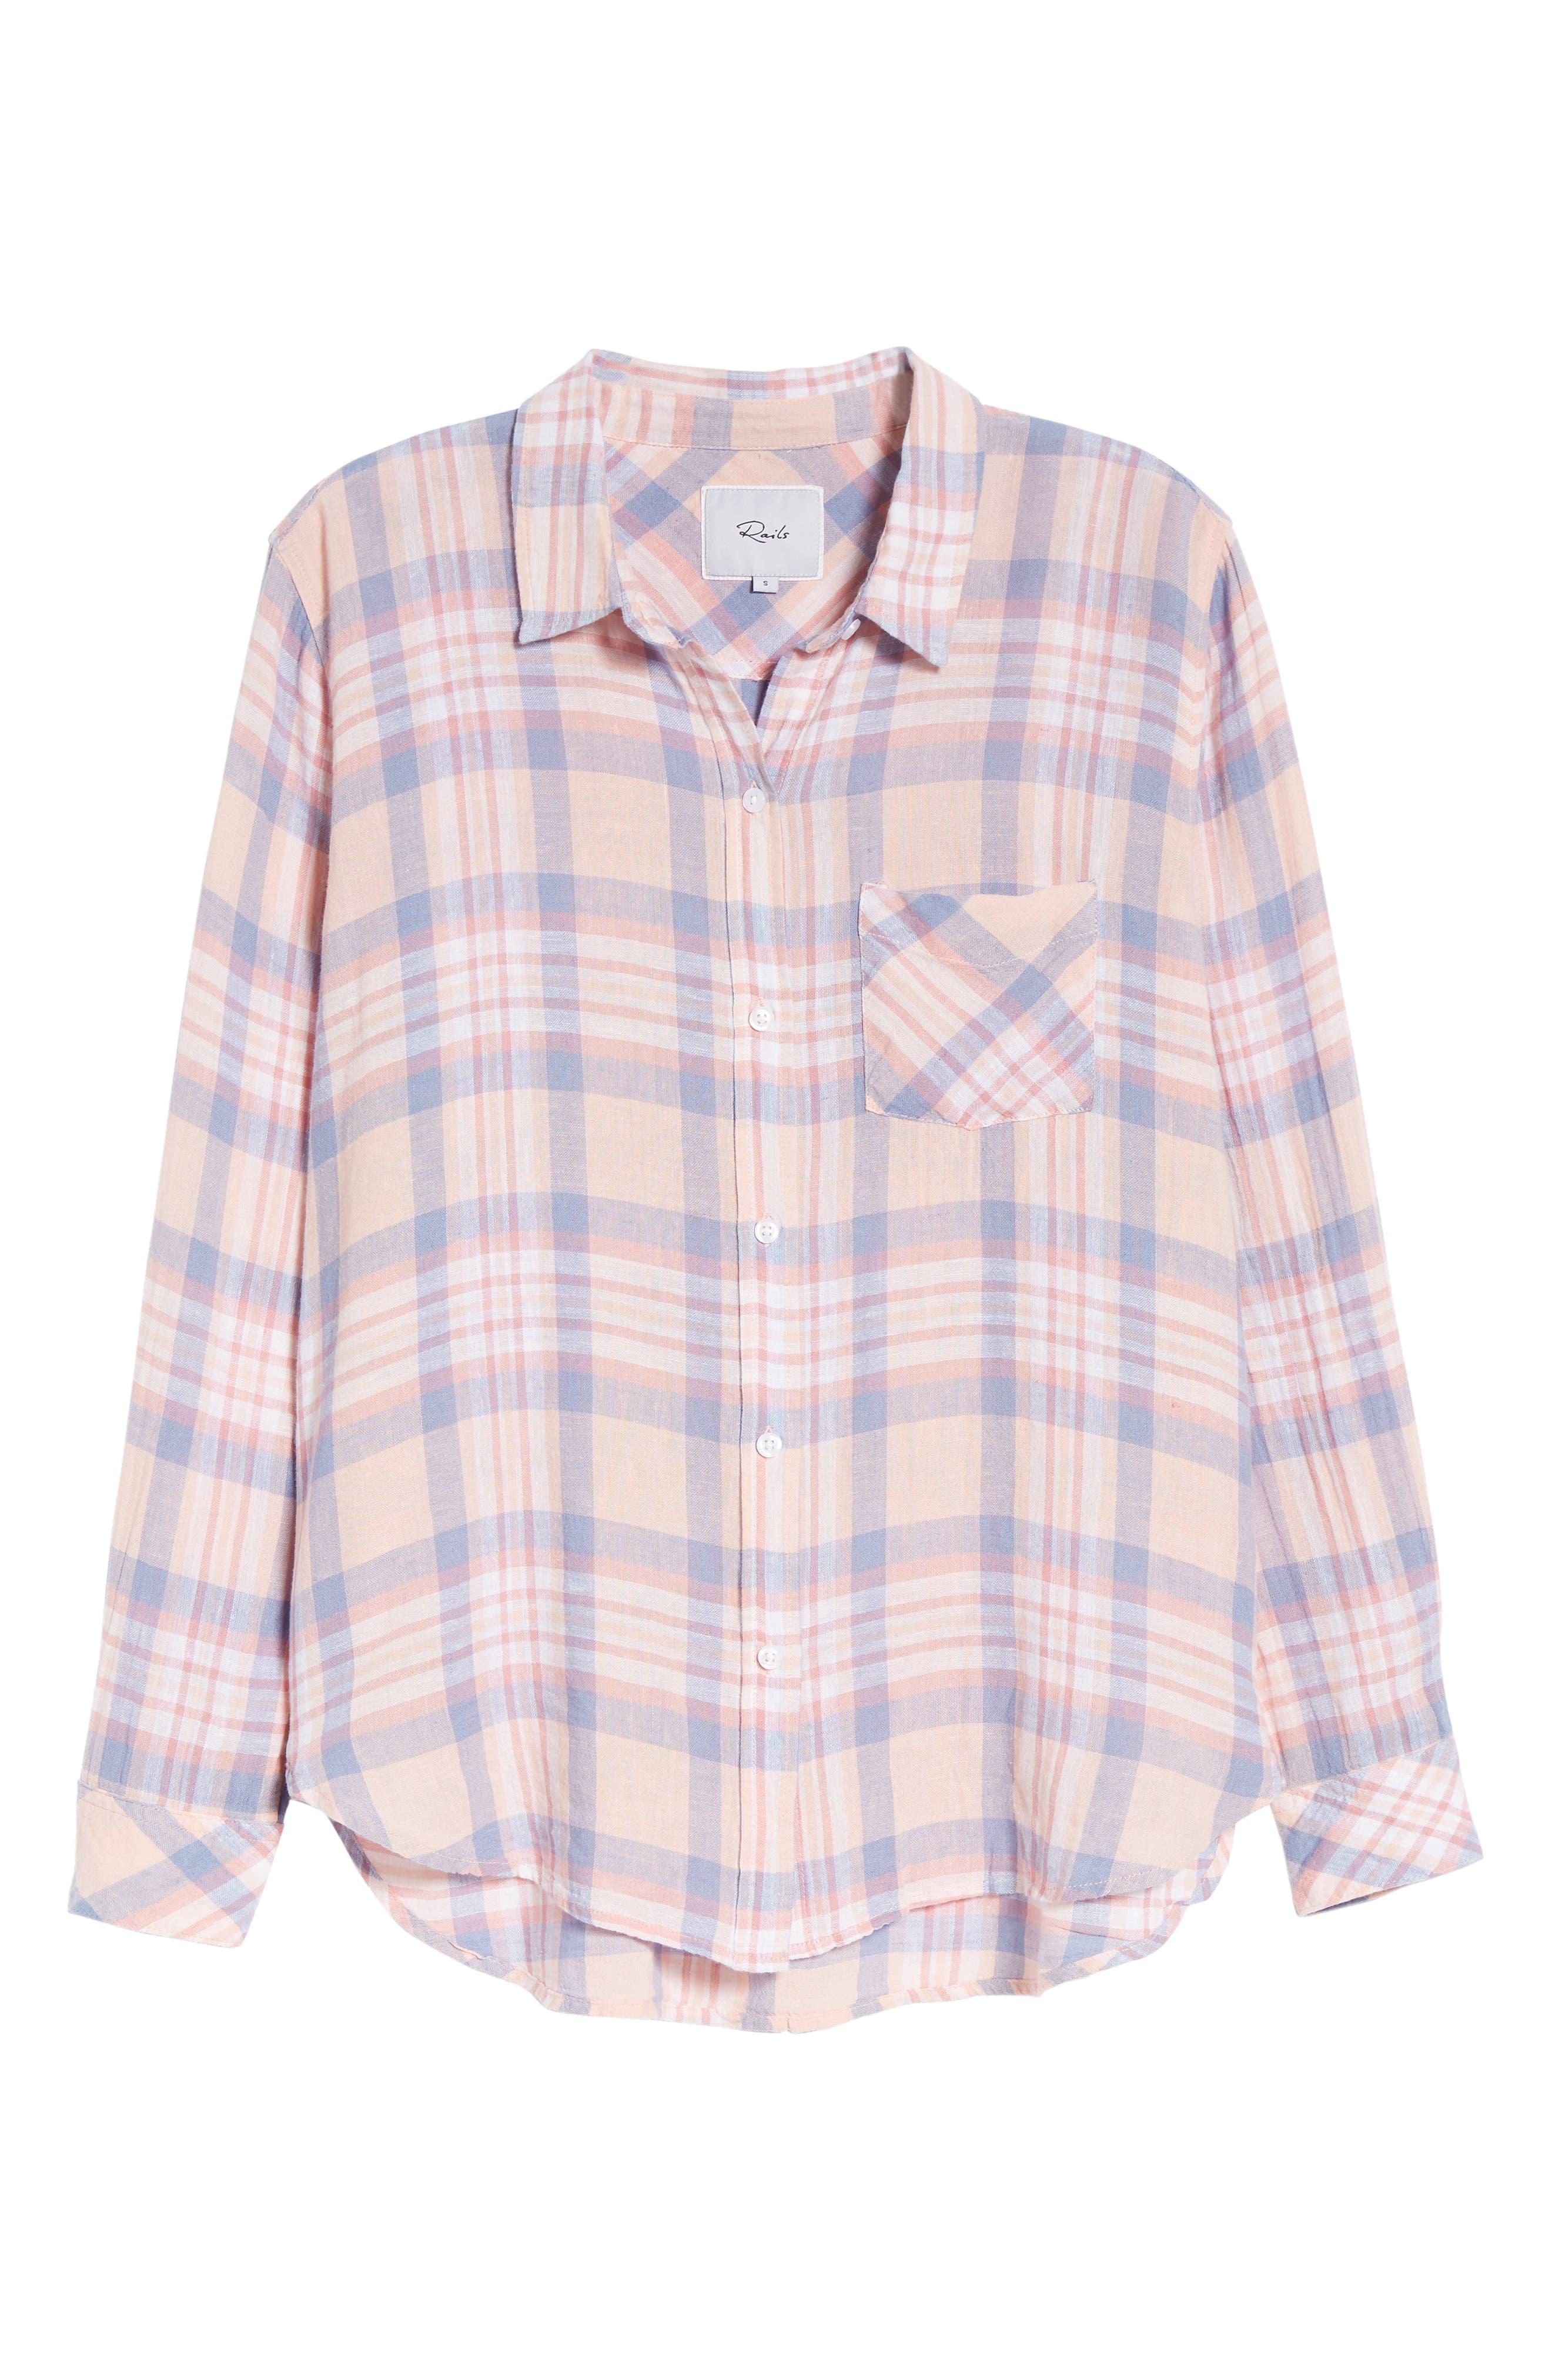 Charli Shirt,                             Alternate thumbnail 7, color,                             Peach Blush Blue